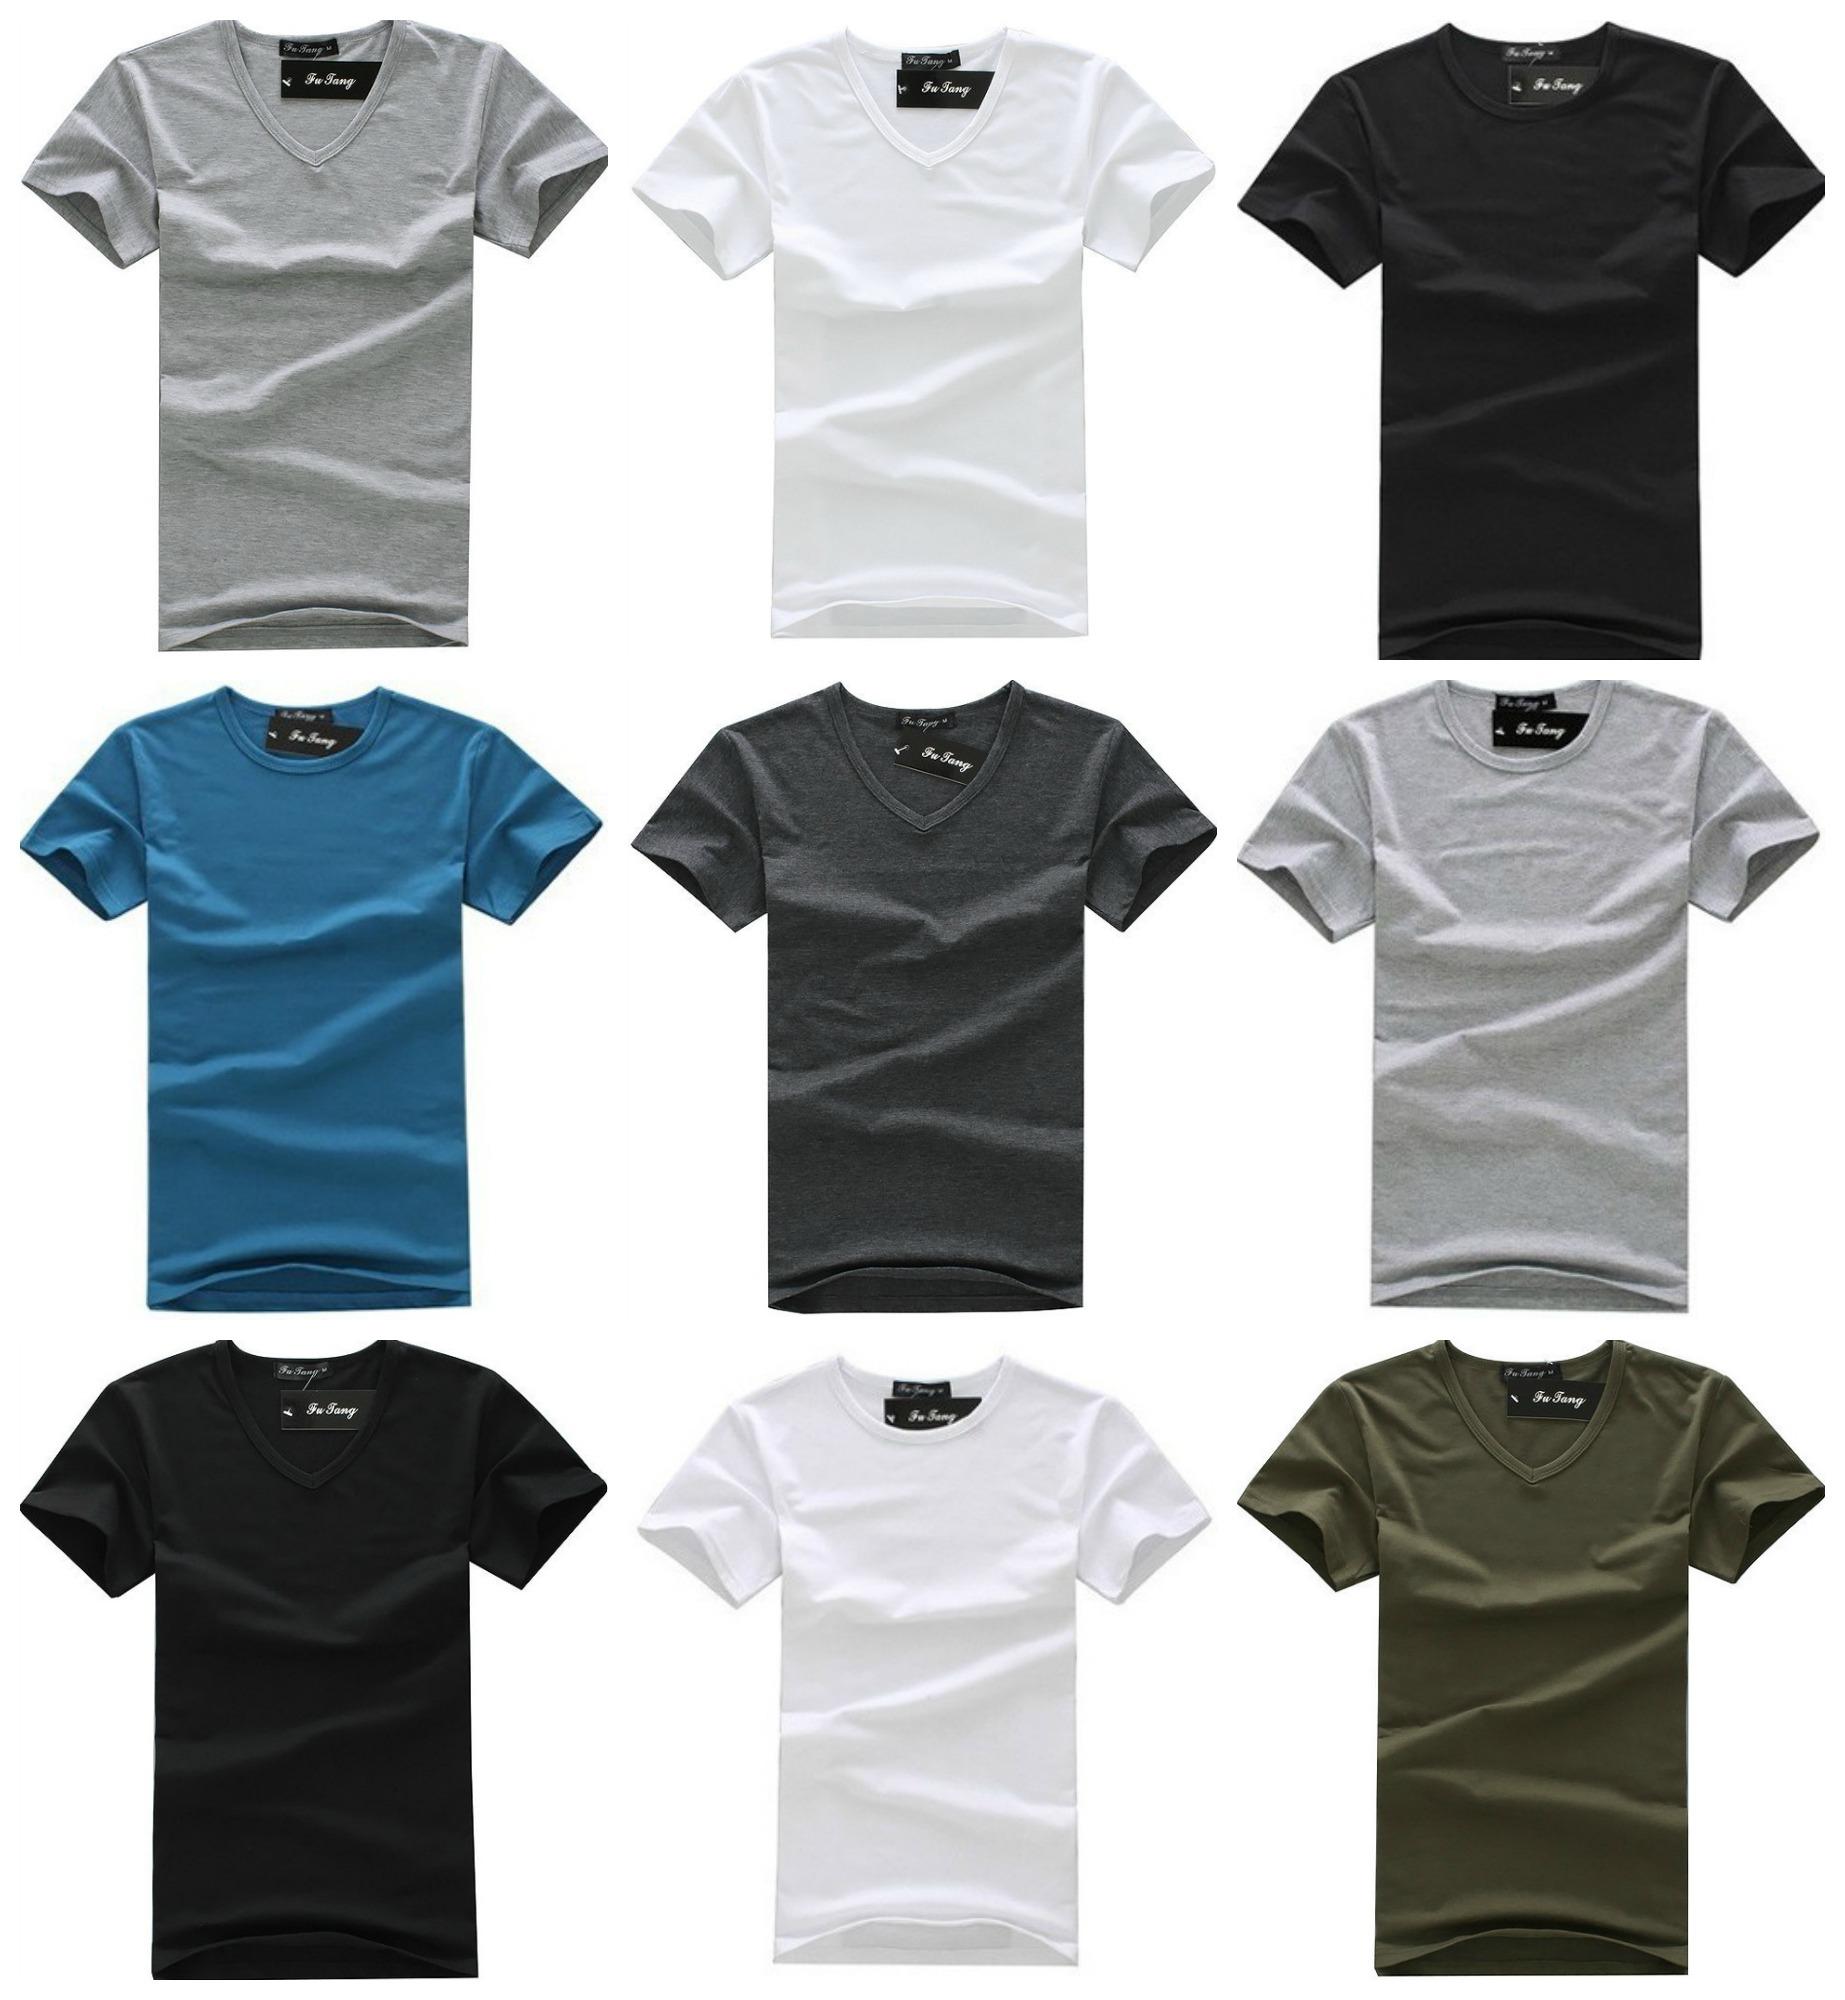 bf14750856 Camiseta Fashion Basica Moderna - Gola V - em 5 Cores